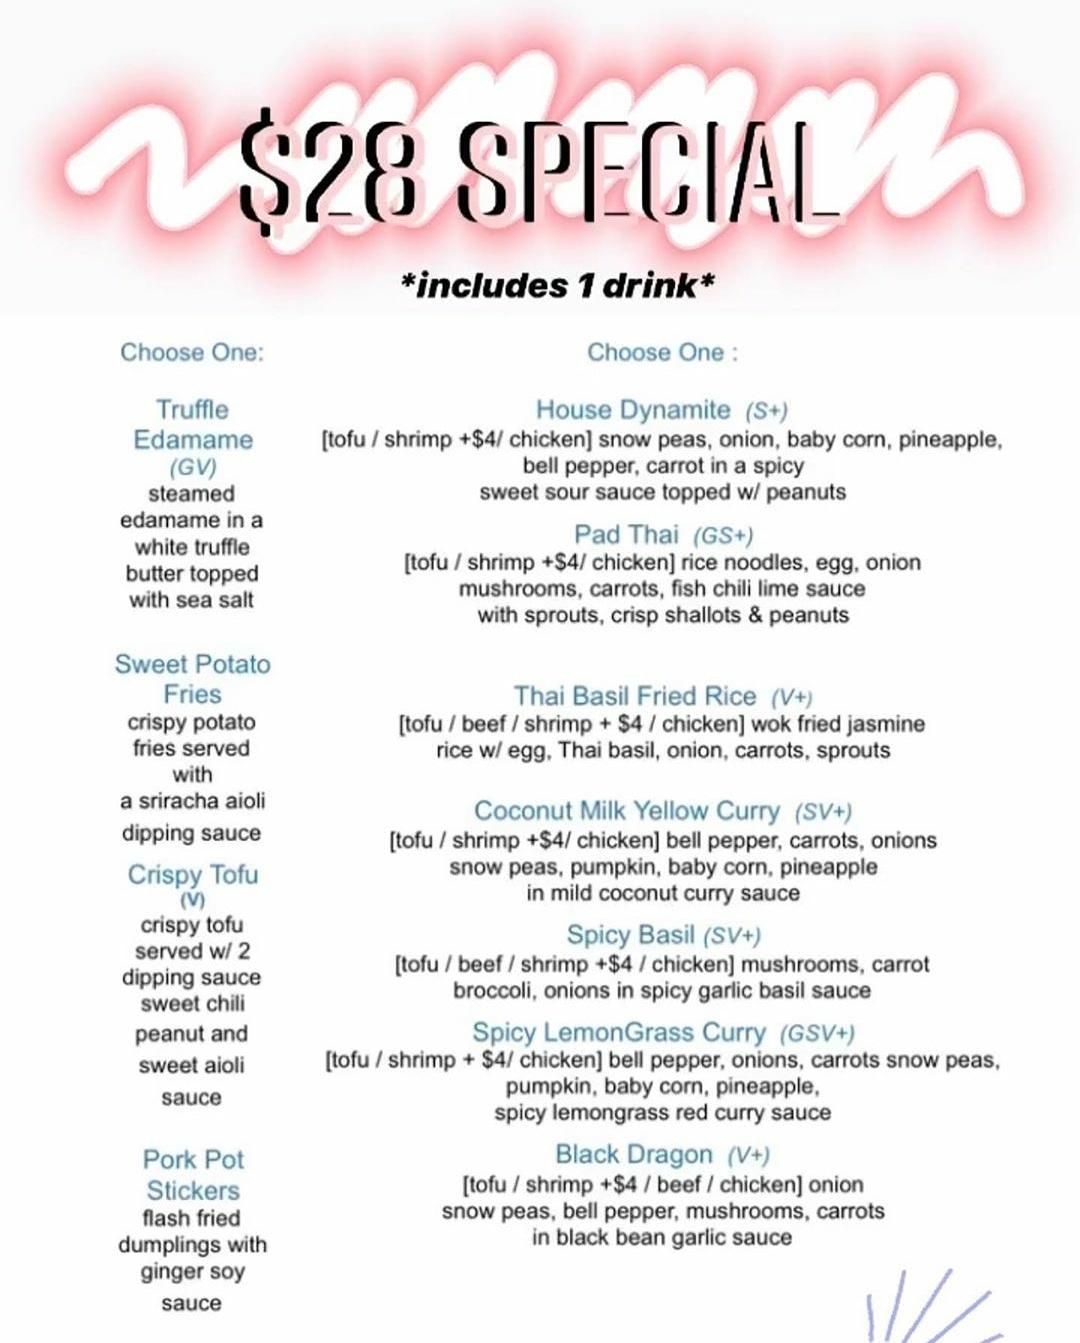 #redthai_shabuphx #kalvinarailias #restaurant #food #cuisine #foodie #restaurants #salad #thaifood #padthai #asianfood #asiandrink #arizona #phoenixarizona #phoenixaz #scottsdaleaz #tempeaz #mesaaz #glendaleaz #chandleraz #tucsonaz #scottsdalearizona #paysonaz #prescottaz #yumaaz #sedonaaz #scottsdalearizona